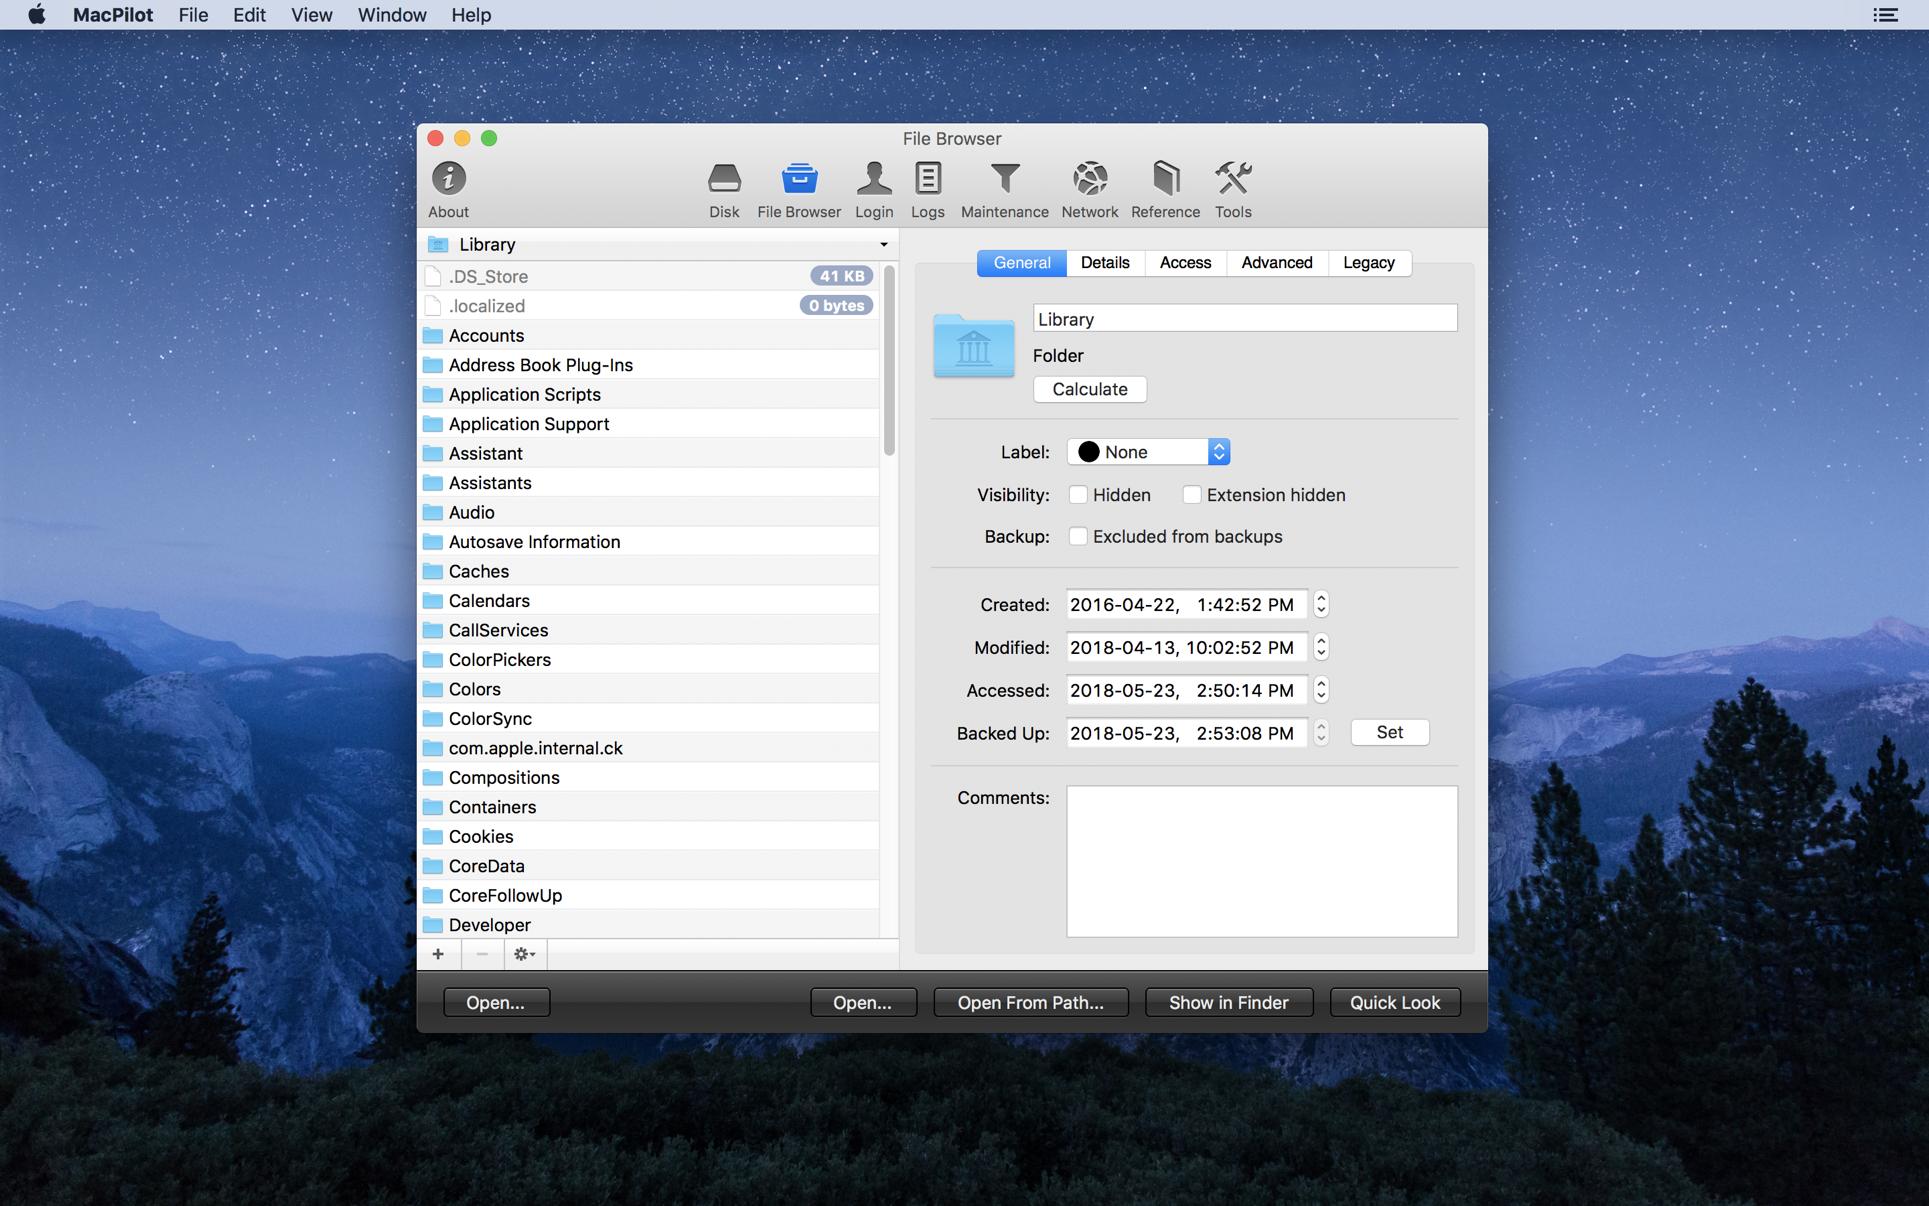 MacPilot 13.0 Mac 破解版 Mac上优秀的系统辅助增强工具